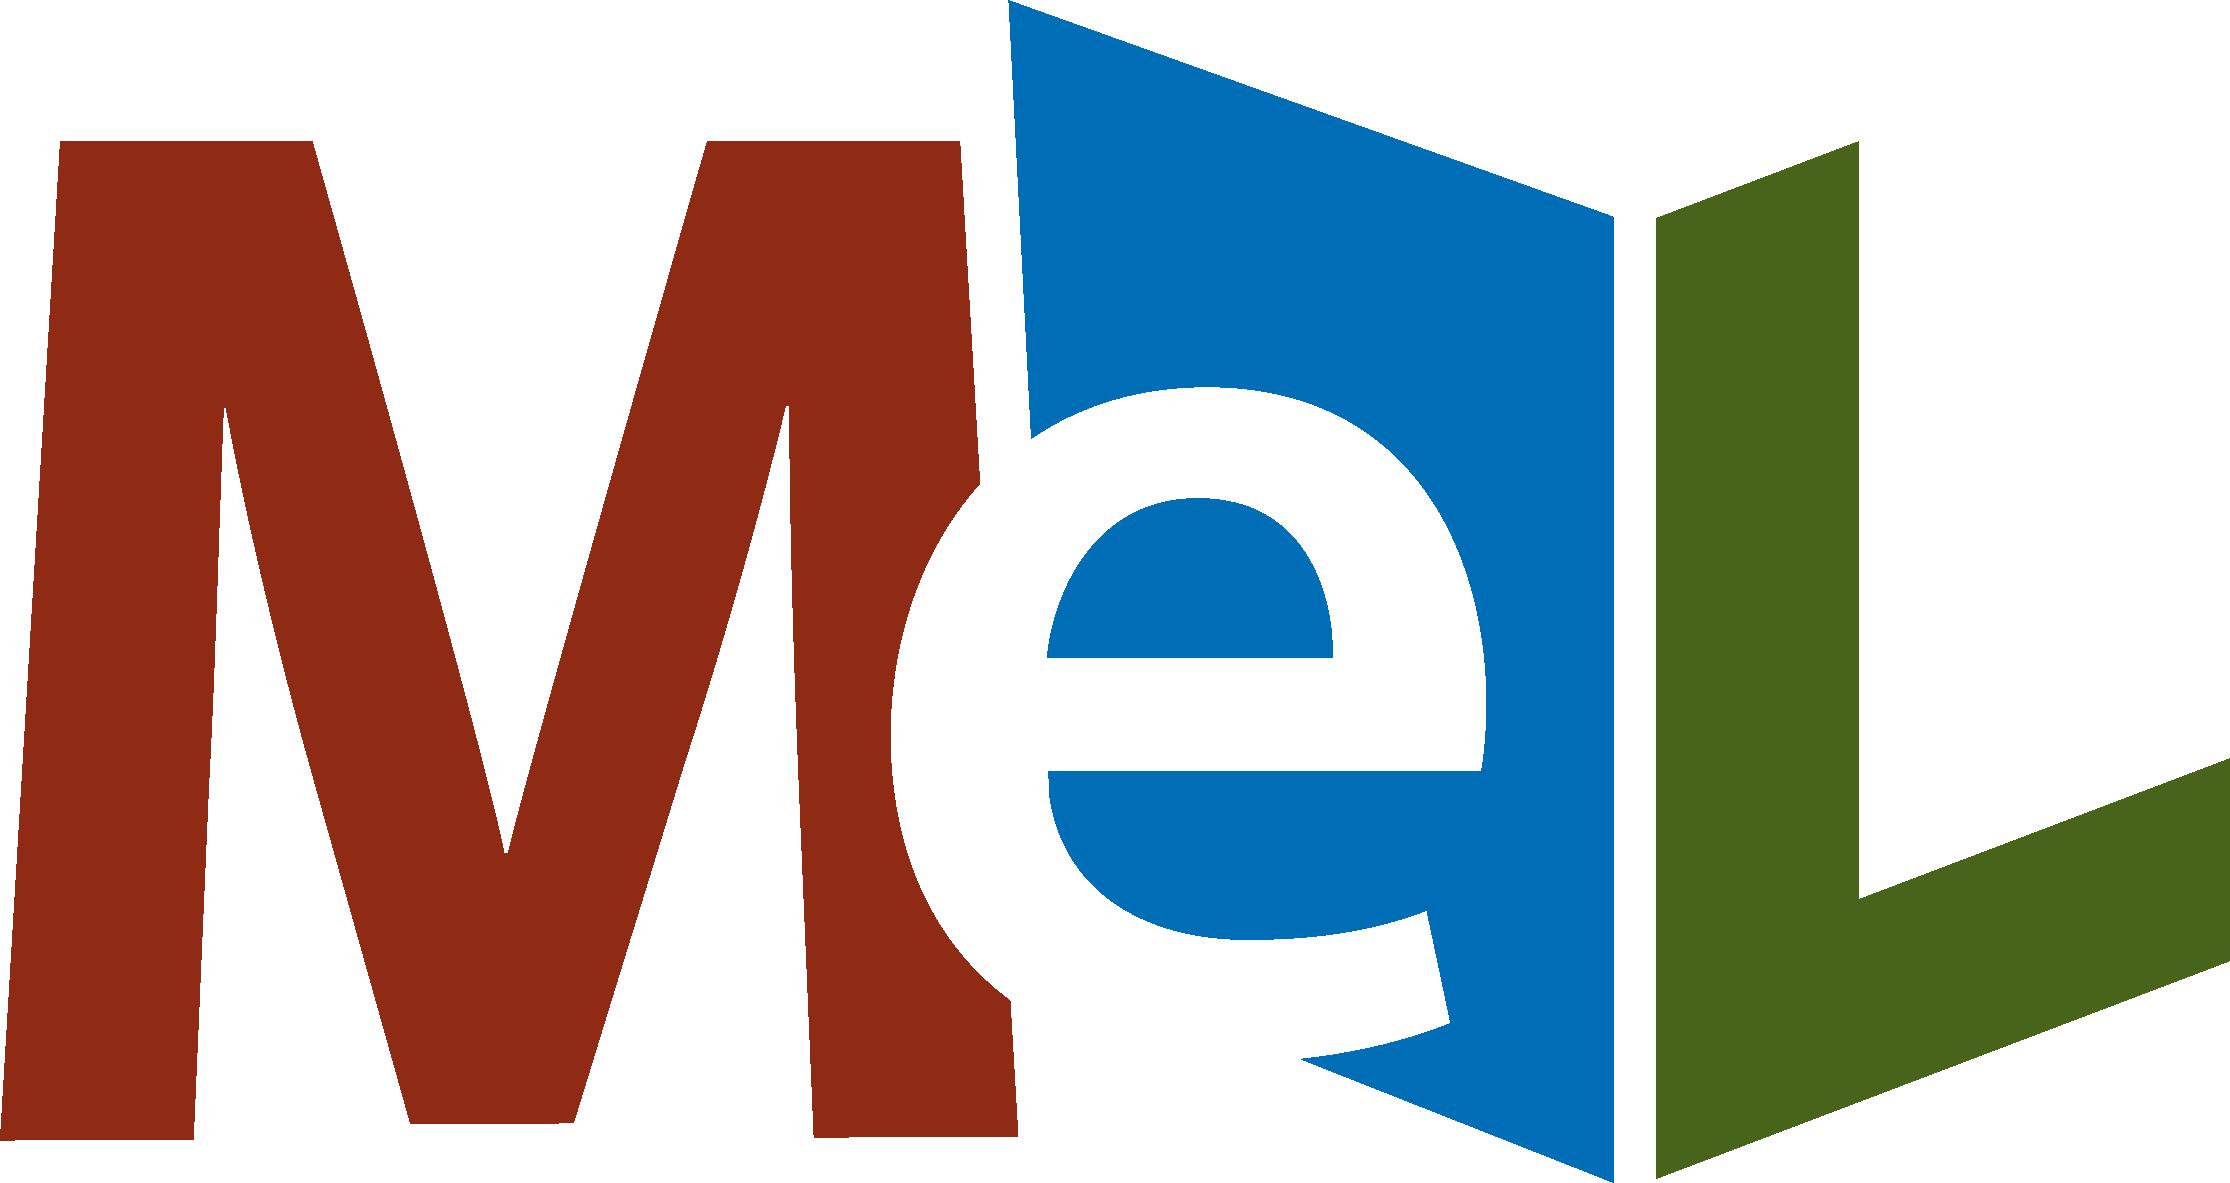 mel color logo 2018